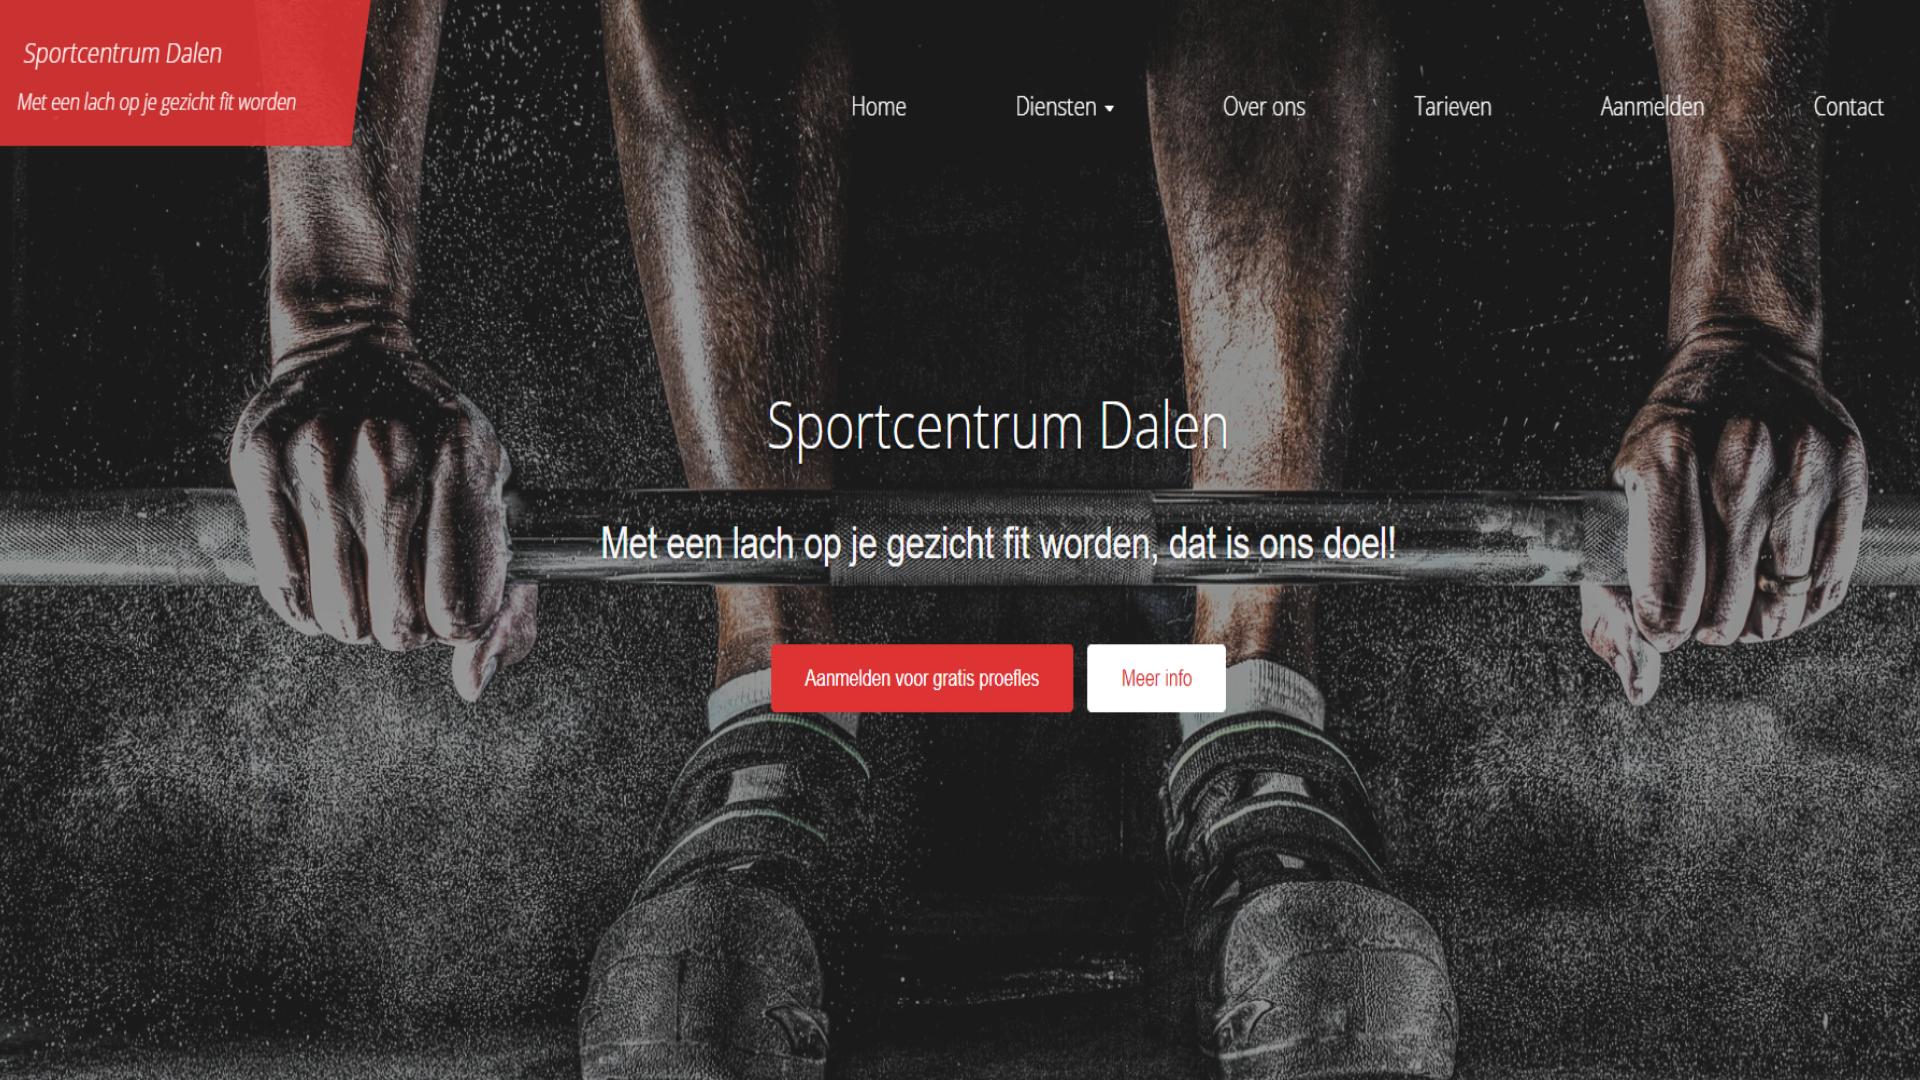 Sportcentrum Dalen